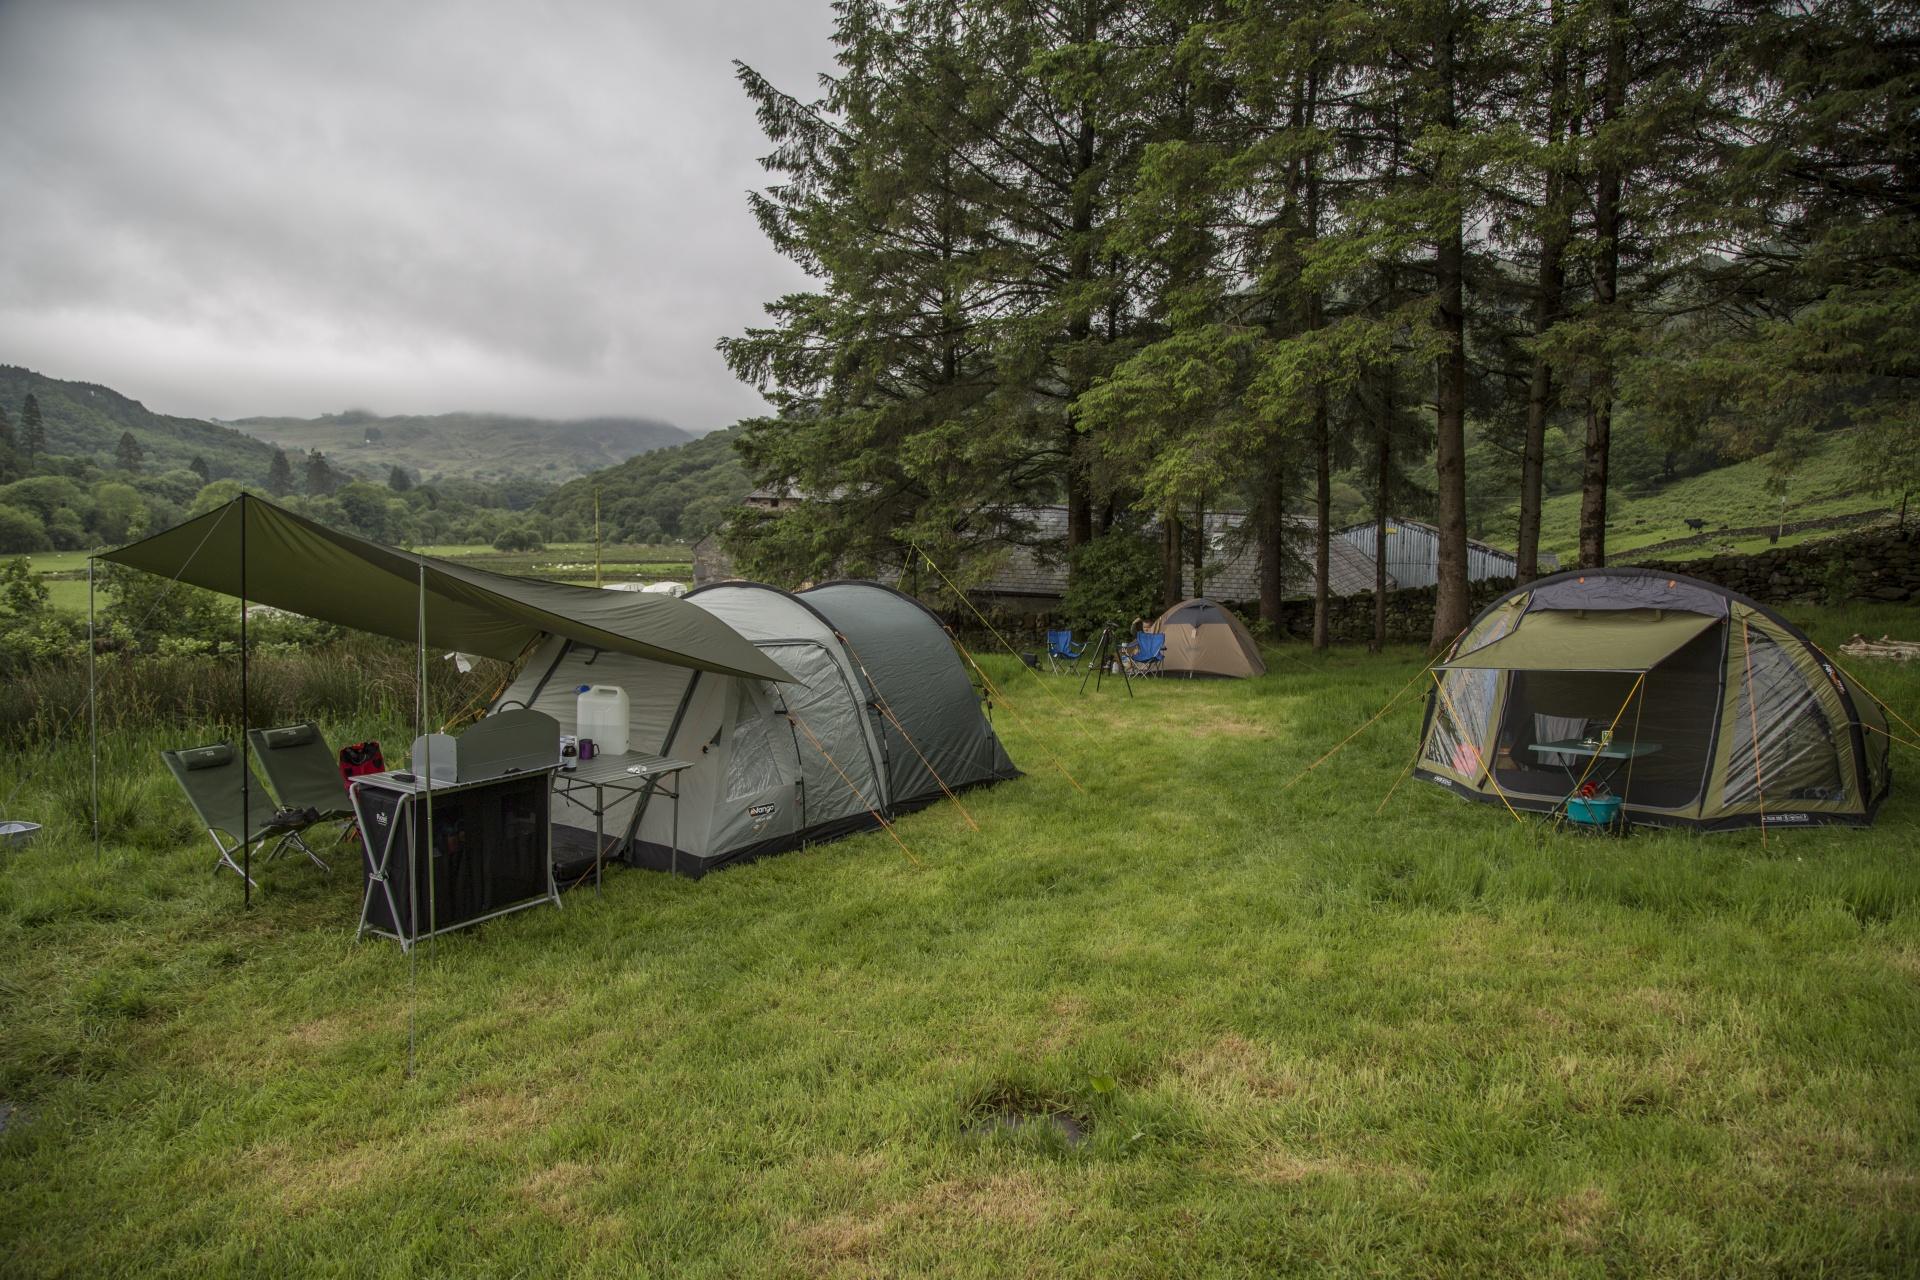 Camp, Camping, Glamping, Motorcoach, RV